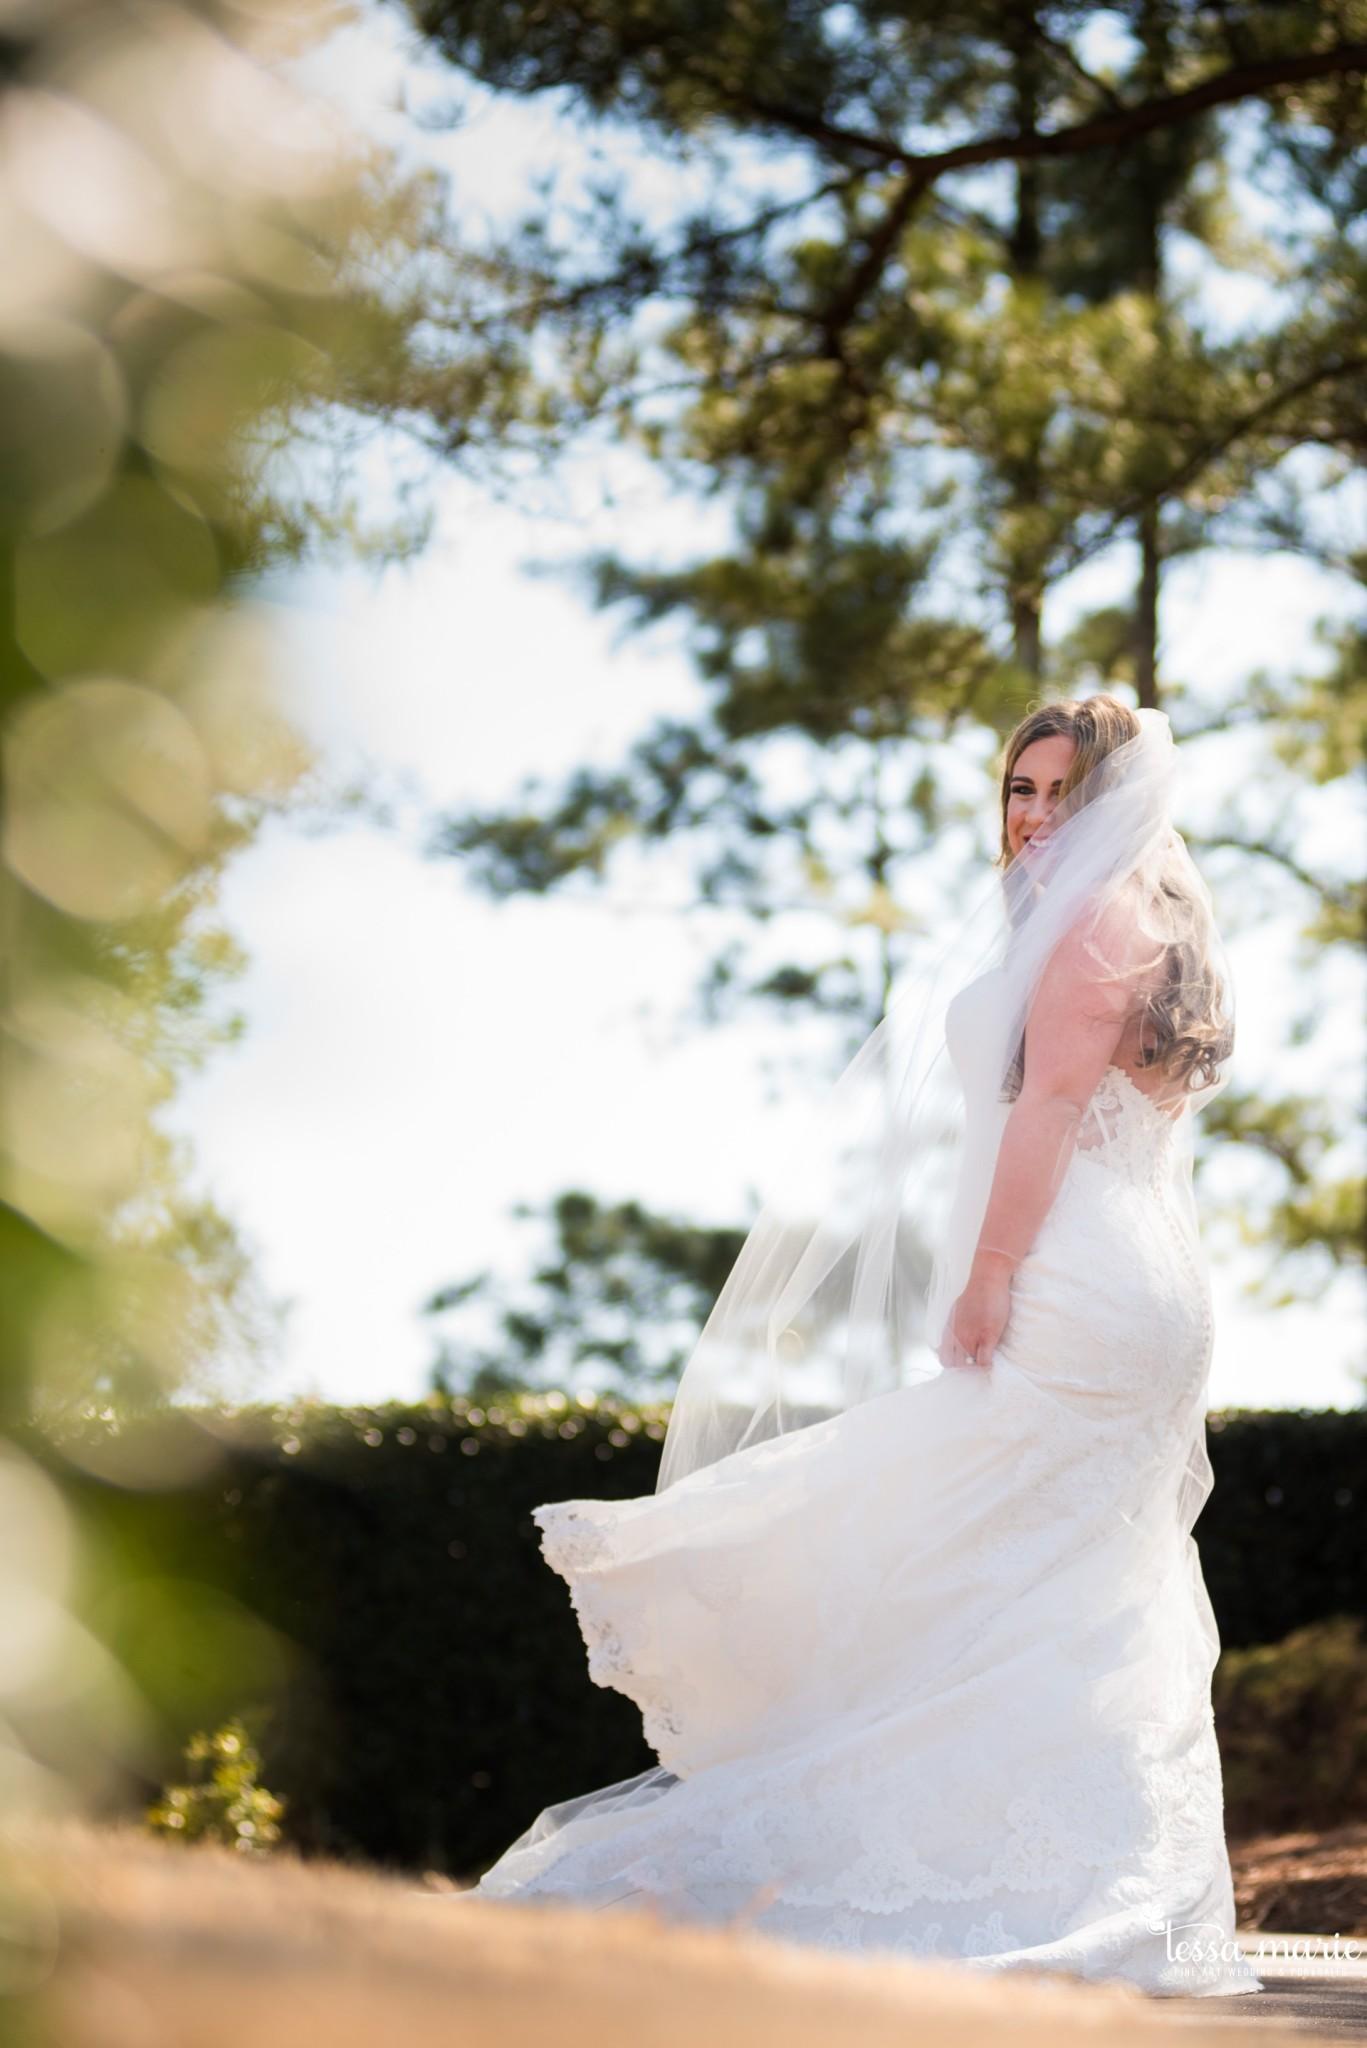 tessa_marie_legacy_moments_storytelling_candid_emotionally_driven_wedding_photographer_atlanta_wedding_photography_st_ives_country_club_wedding_boukates_bridals_by_lori_0008